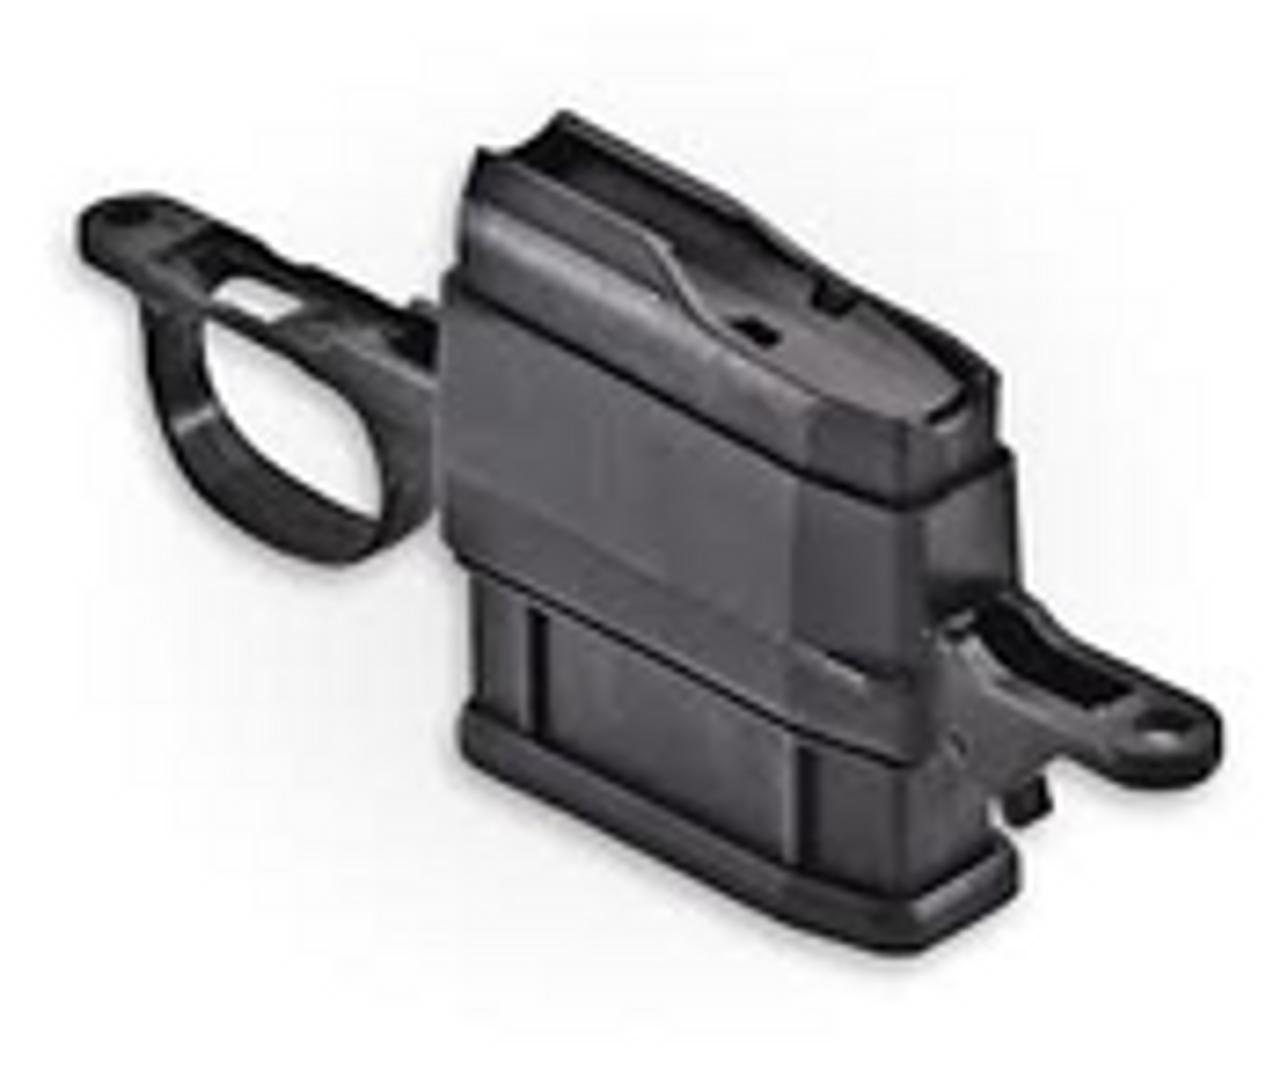 Legacy Sports Howa M1500 Long Action Kits (5rd-.270/.25-06/.30-06-5rd)